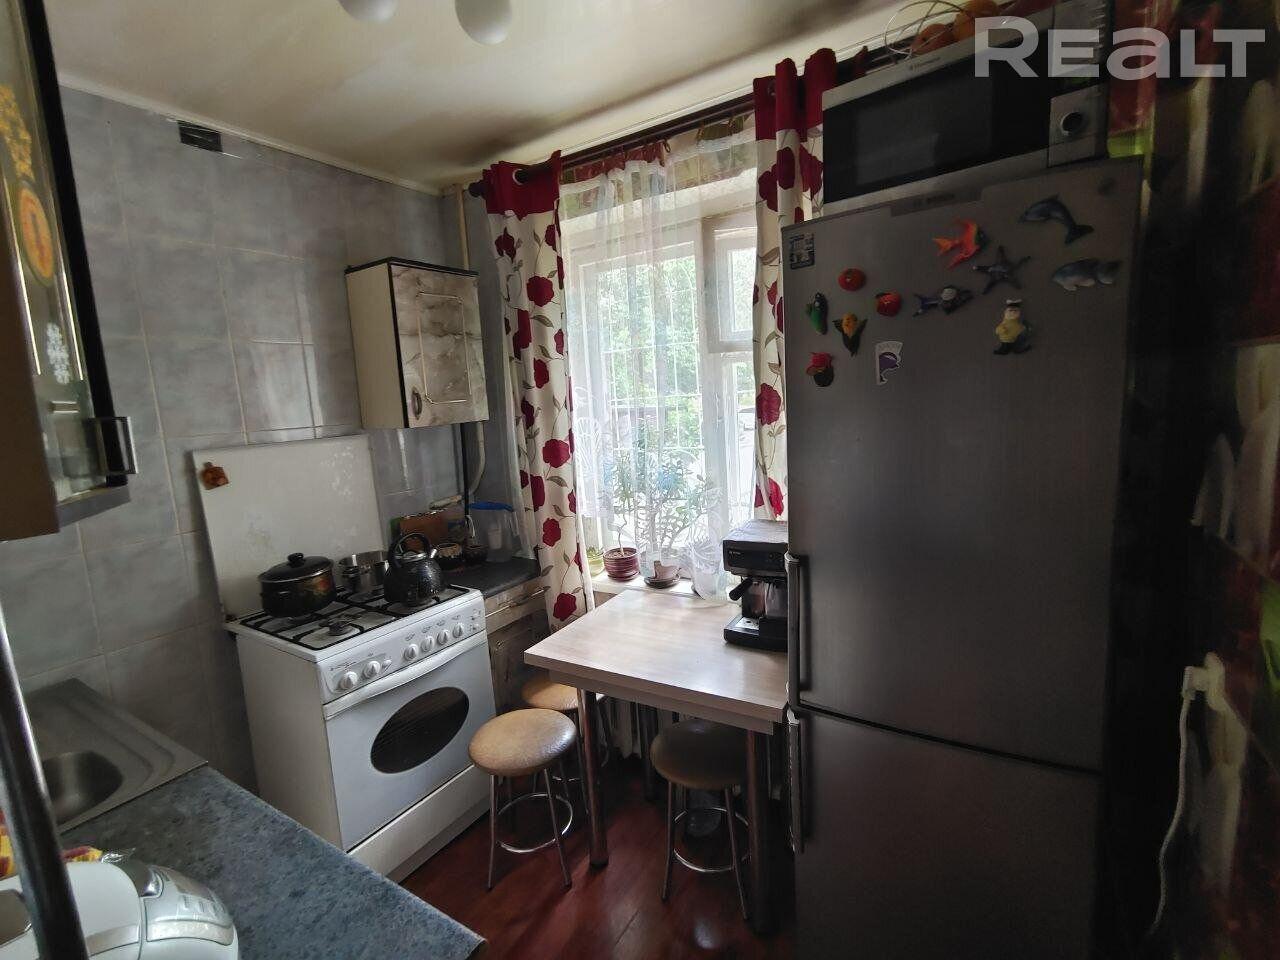 Продается 3-х комнатная квартира, Витебск - фото №8